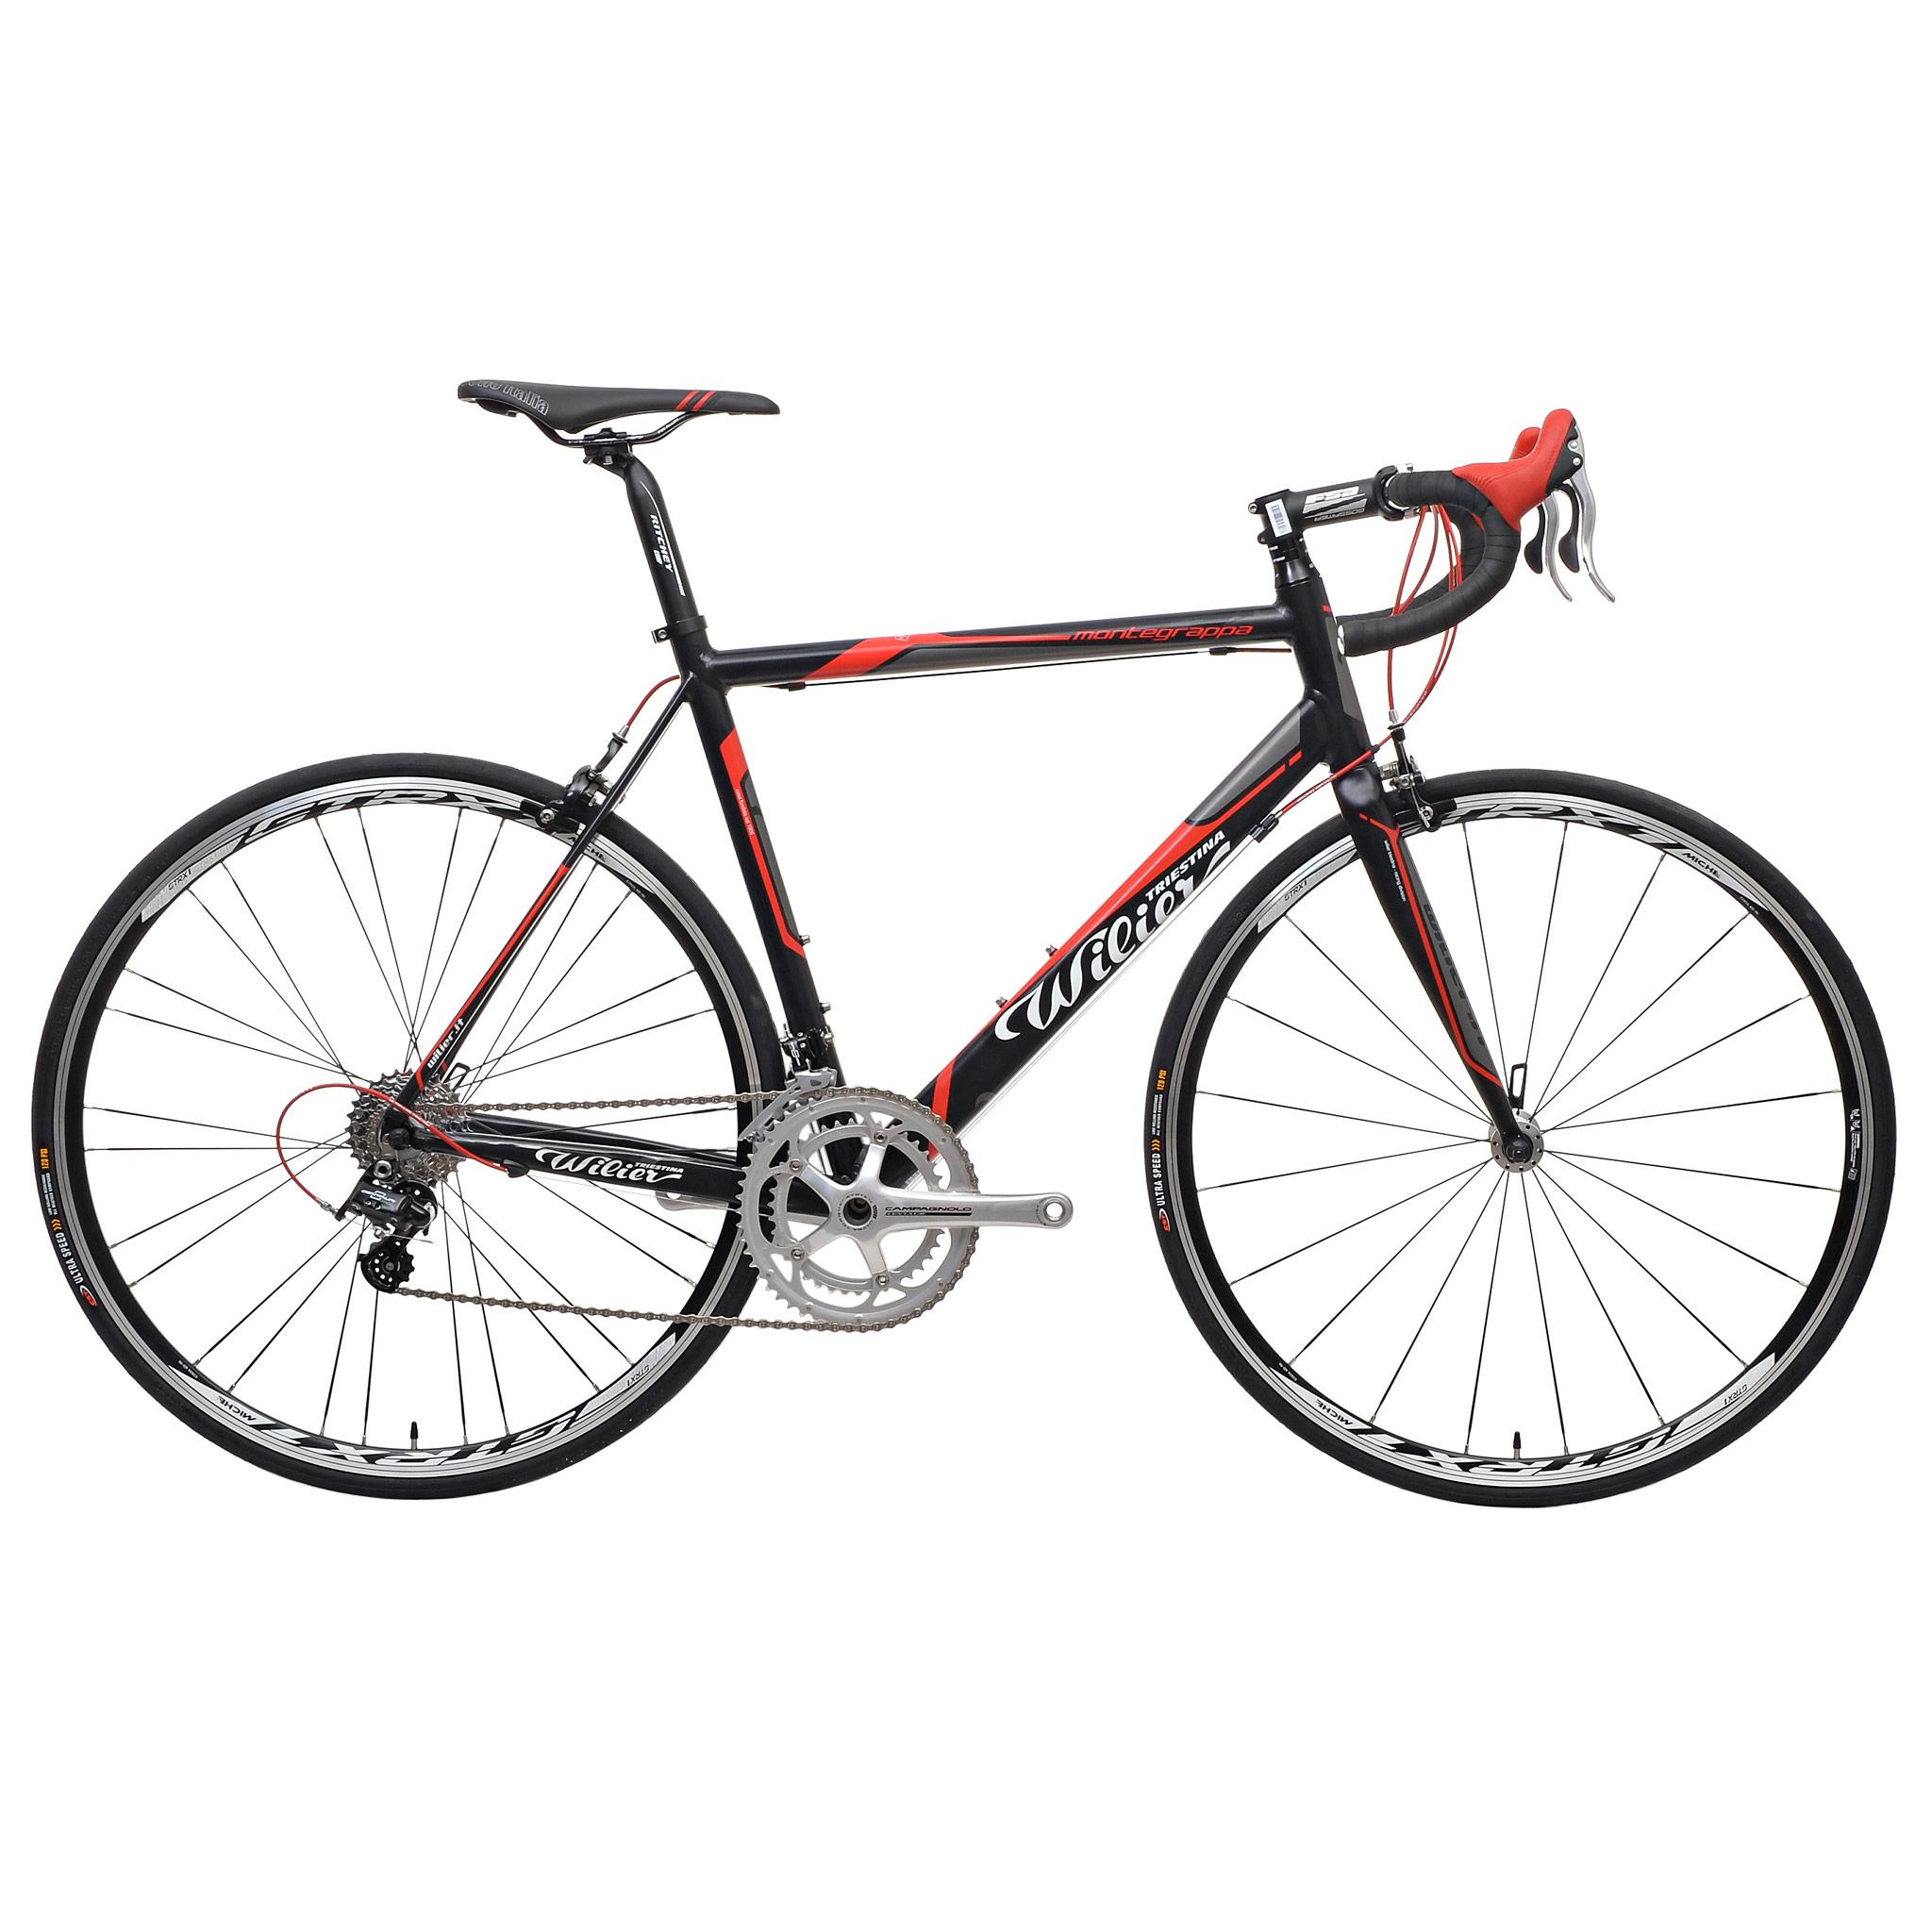 Bicicleta de carrera WILIER TRIESTINA MONTEGRAPPA Campagnolo Centaur 39/53 2015